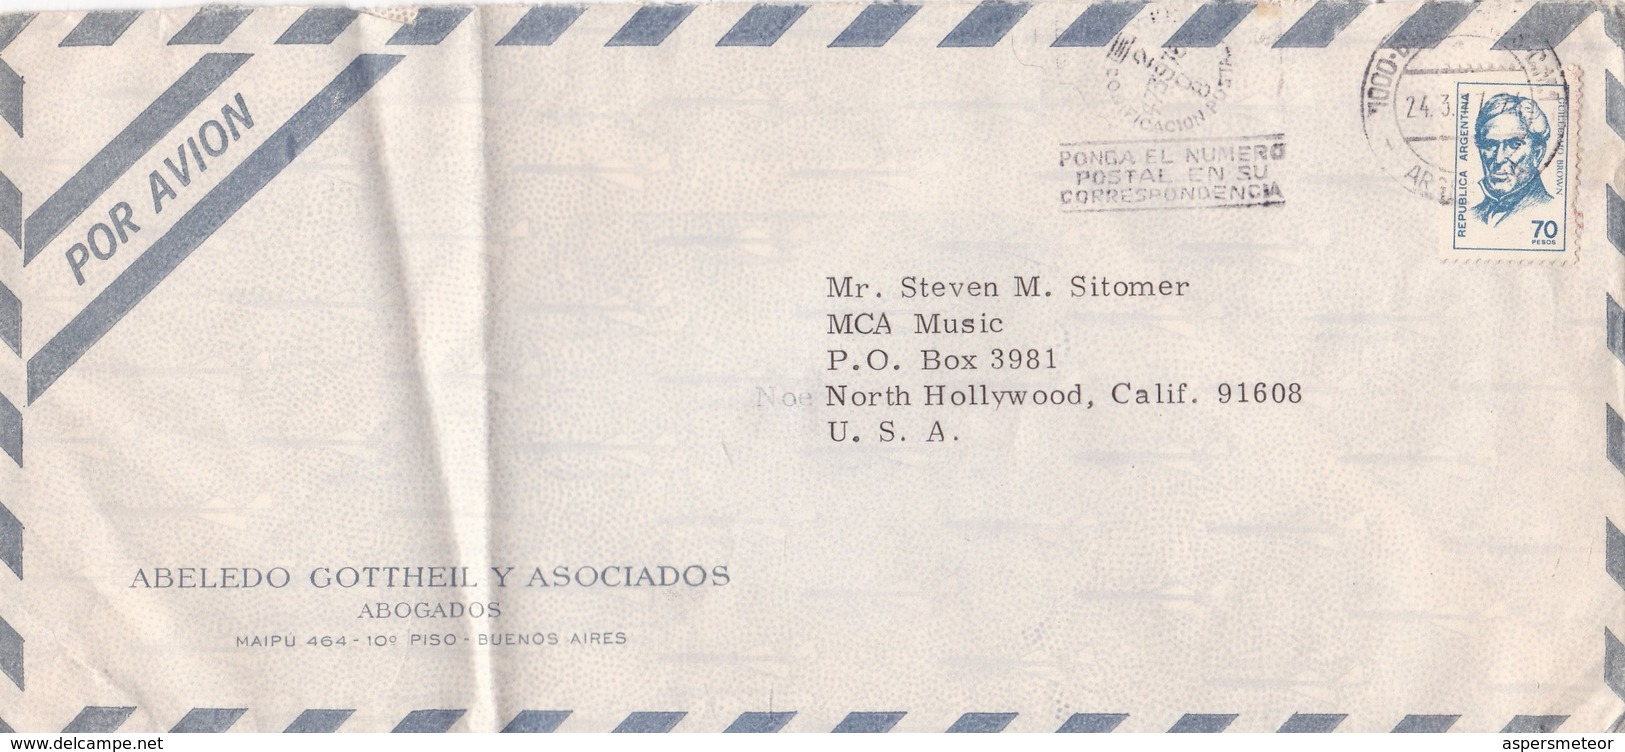 1977 ARGENTINE AIRMAIL COMMERCIAL-ABELEDO GOTTHEIL Y ASOC, ABOGADOS. CIRCULEE TO USA, BANDELETA PARLANTE- BLEUP - Argentina